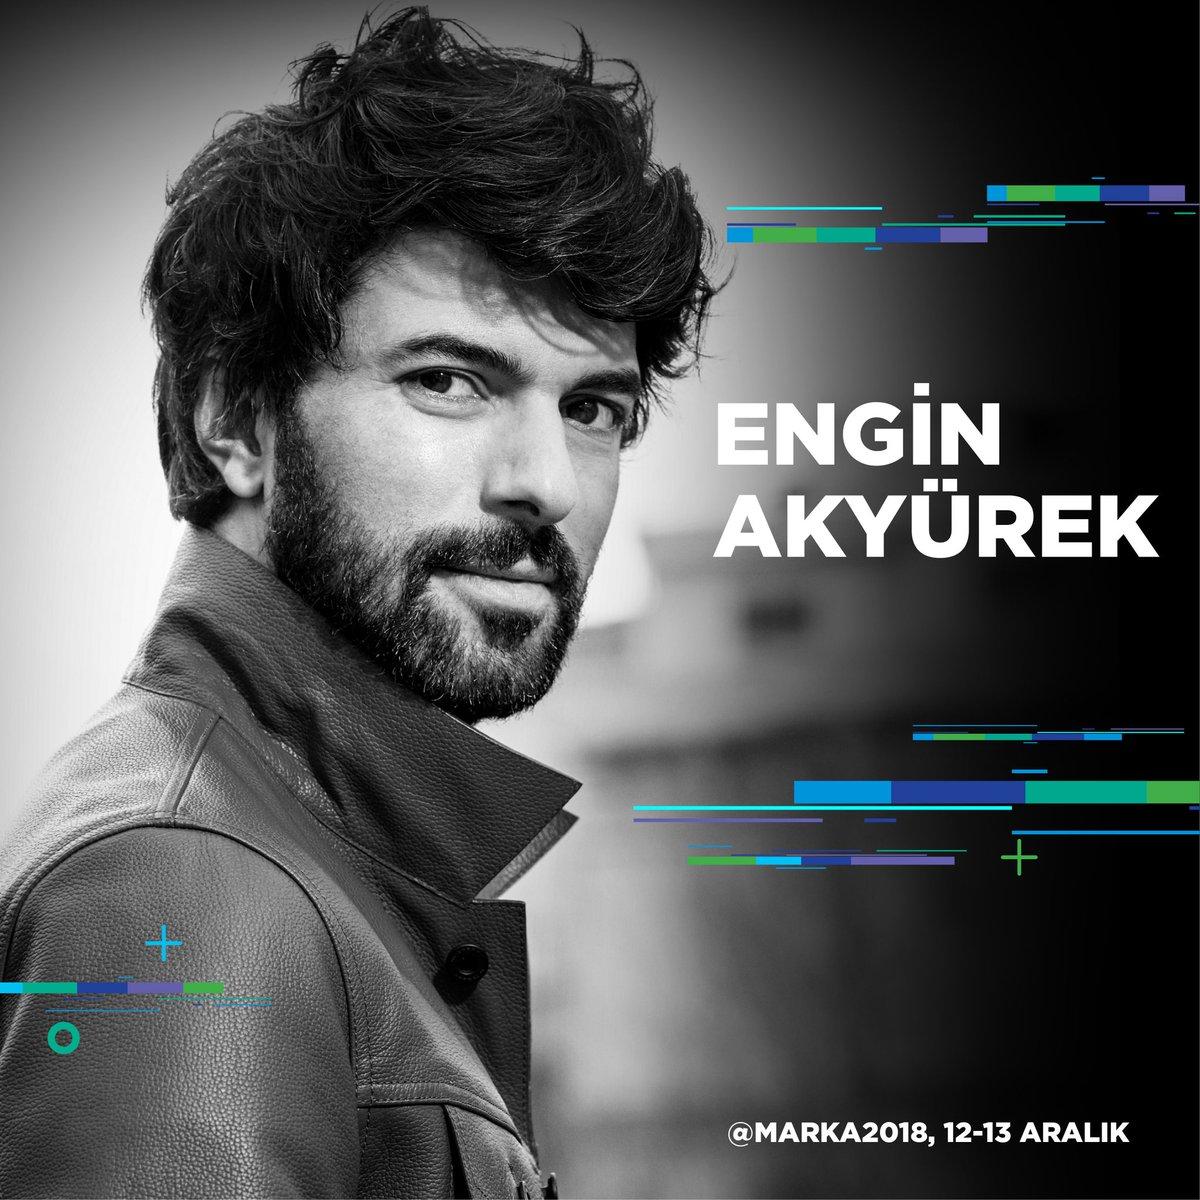 EnginAkyürekGreekfc on Twitter: